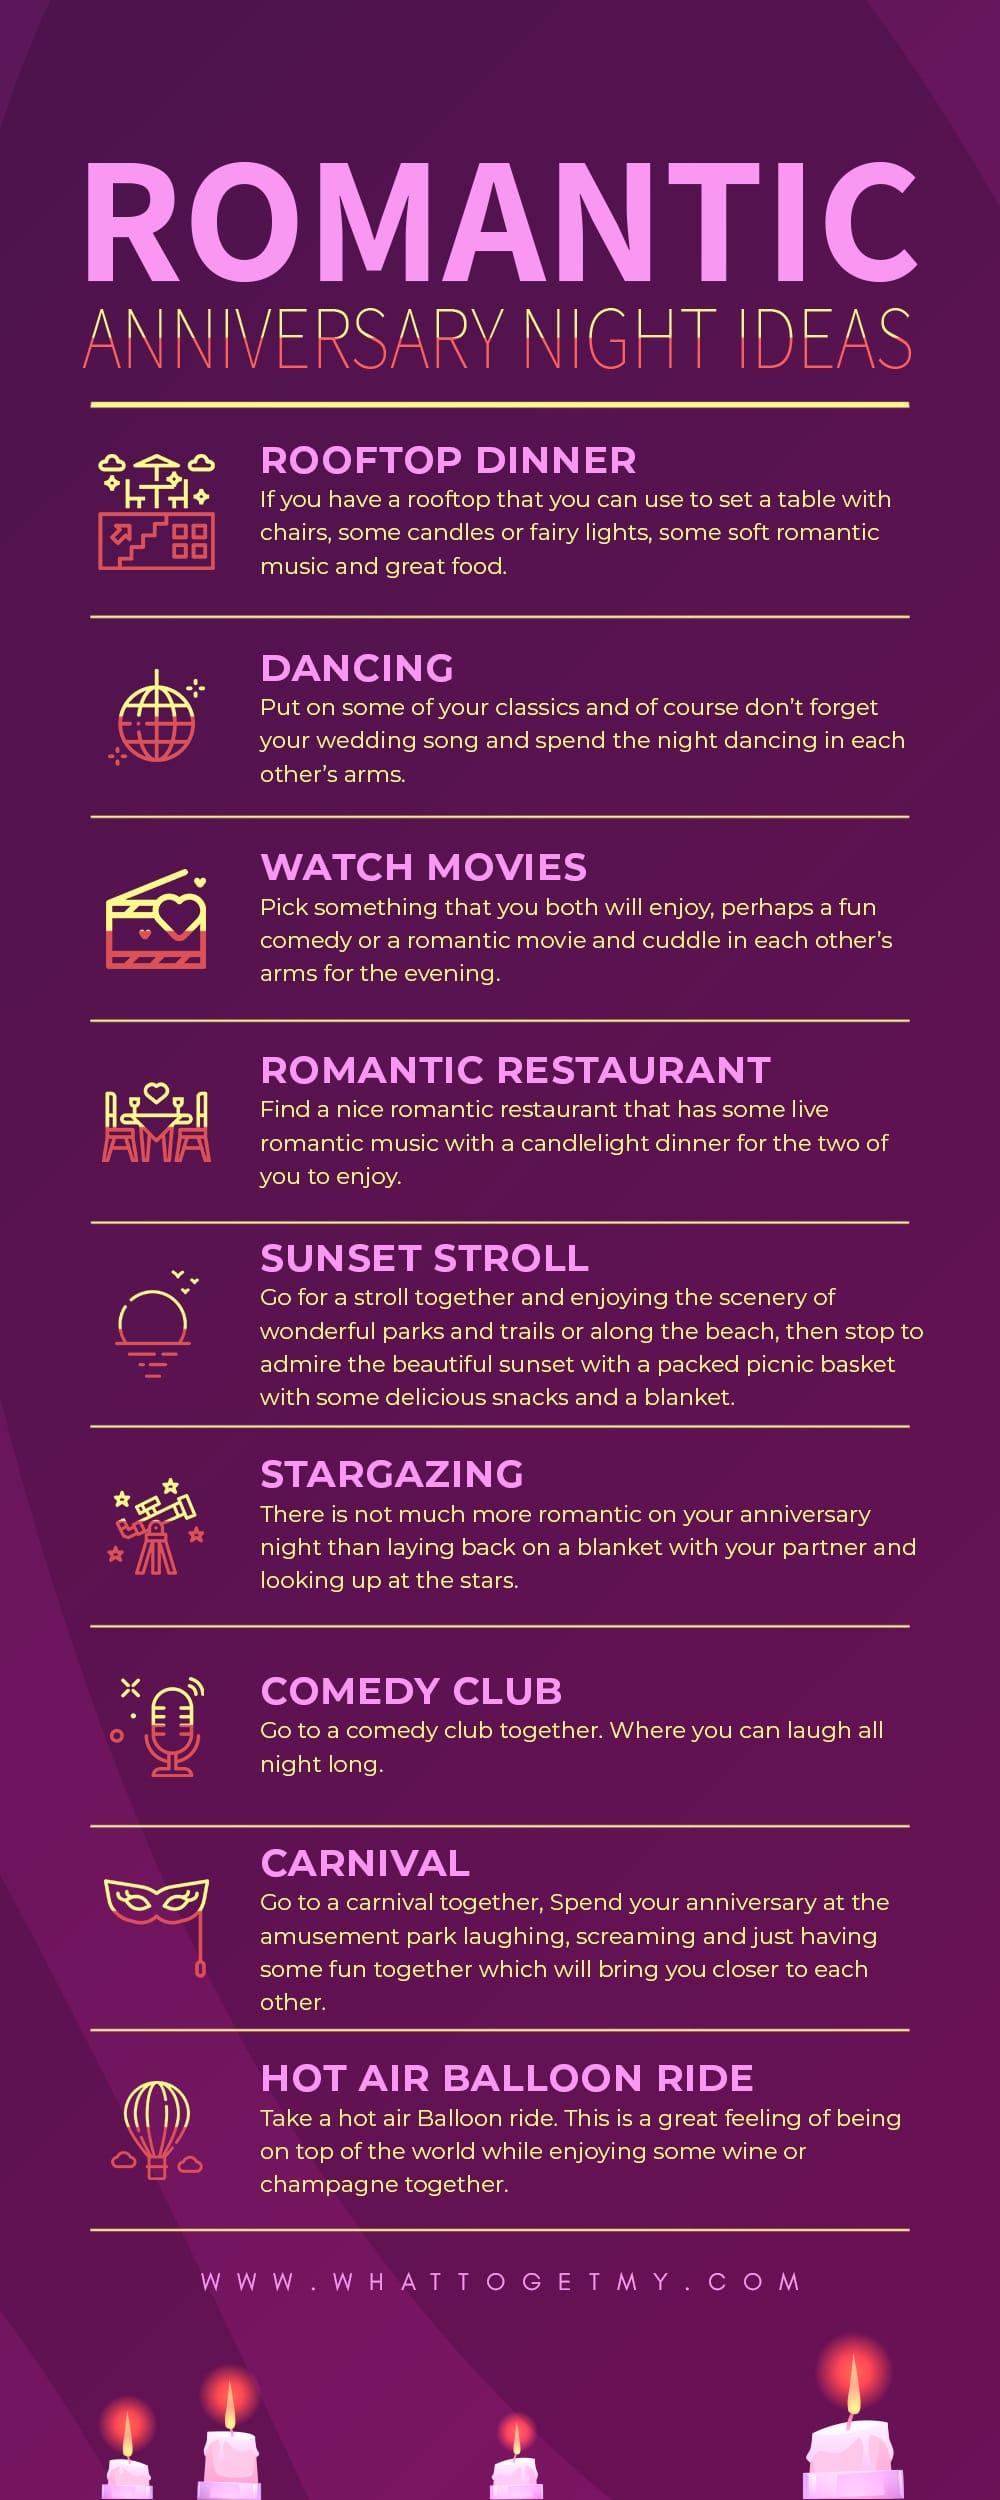 Infographic Romantic Anniversary Night Ideas